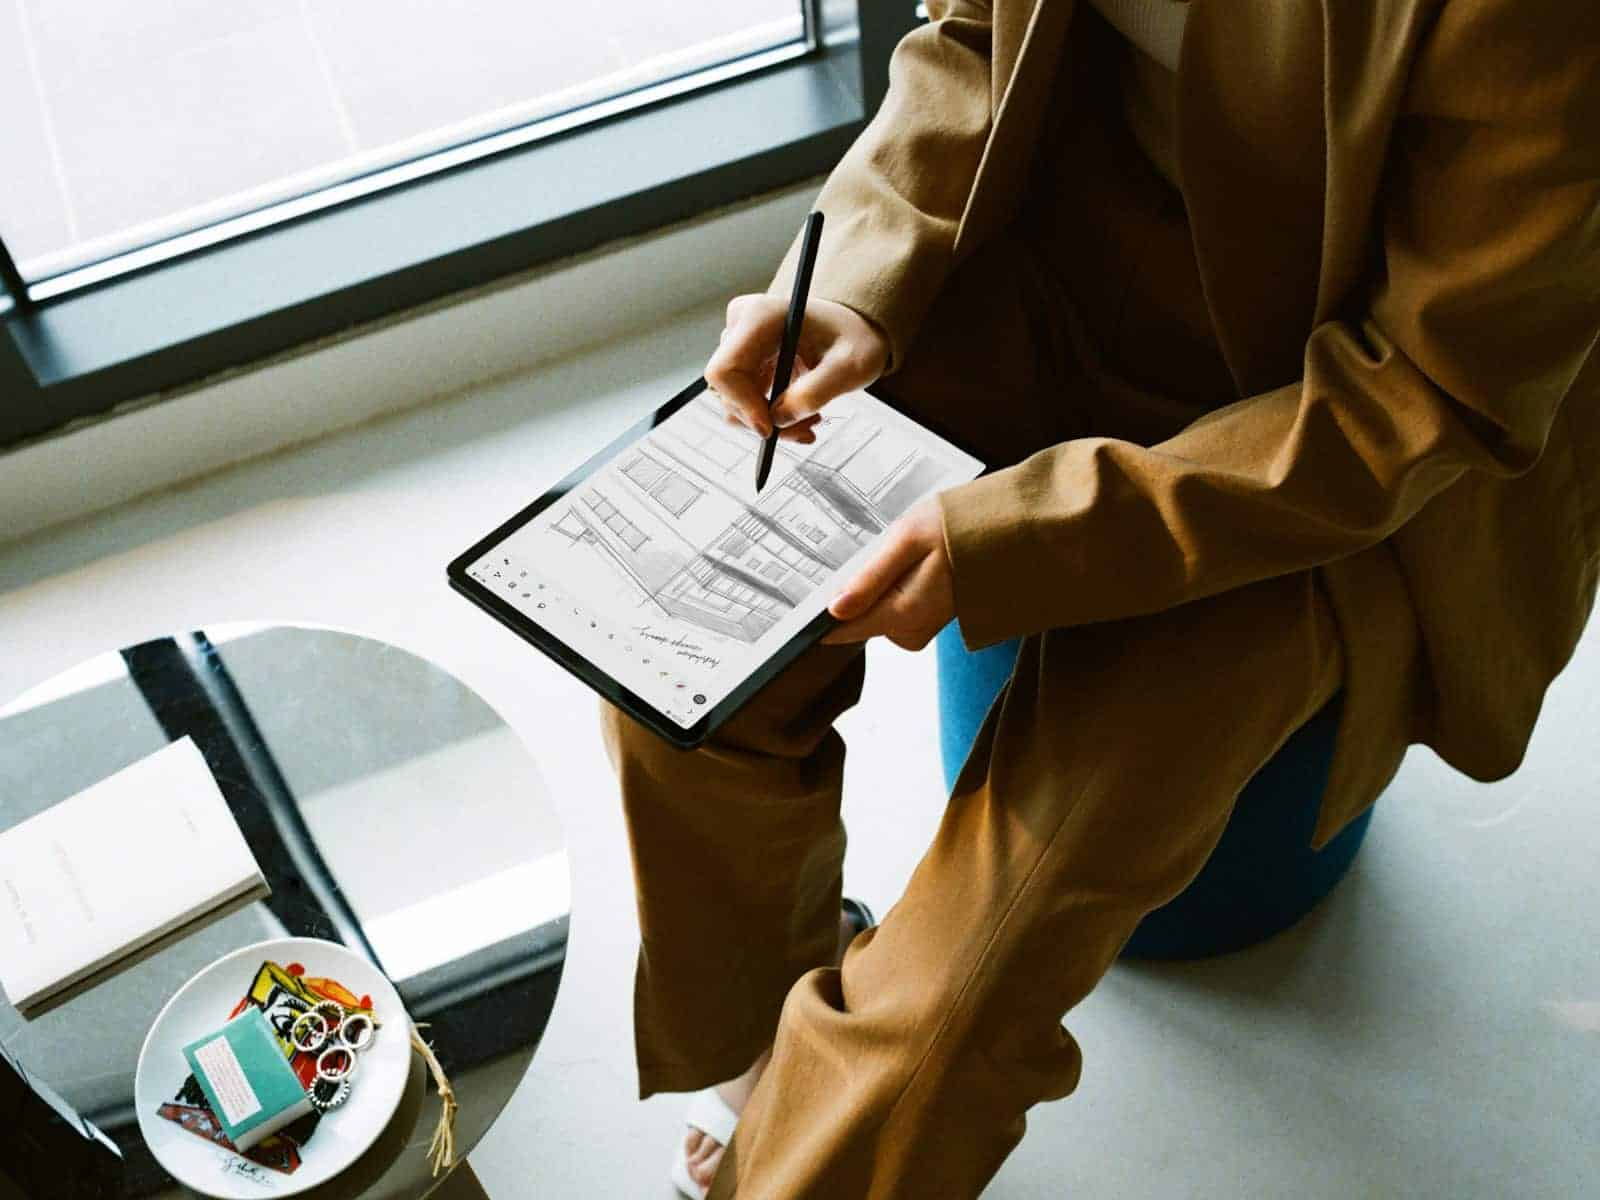 Galaxy Tab S7 S7 Lifestyle Image 5